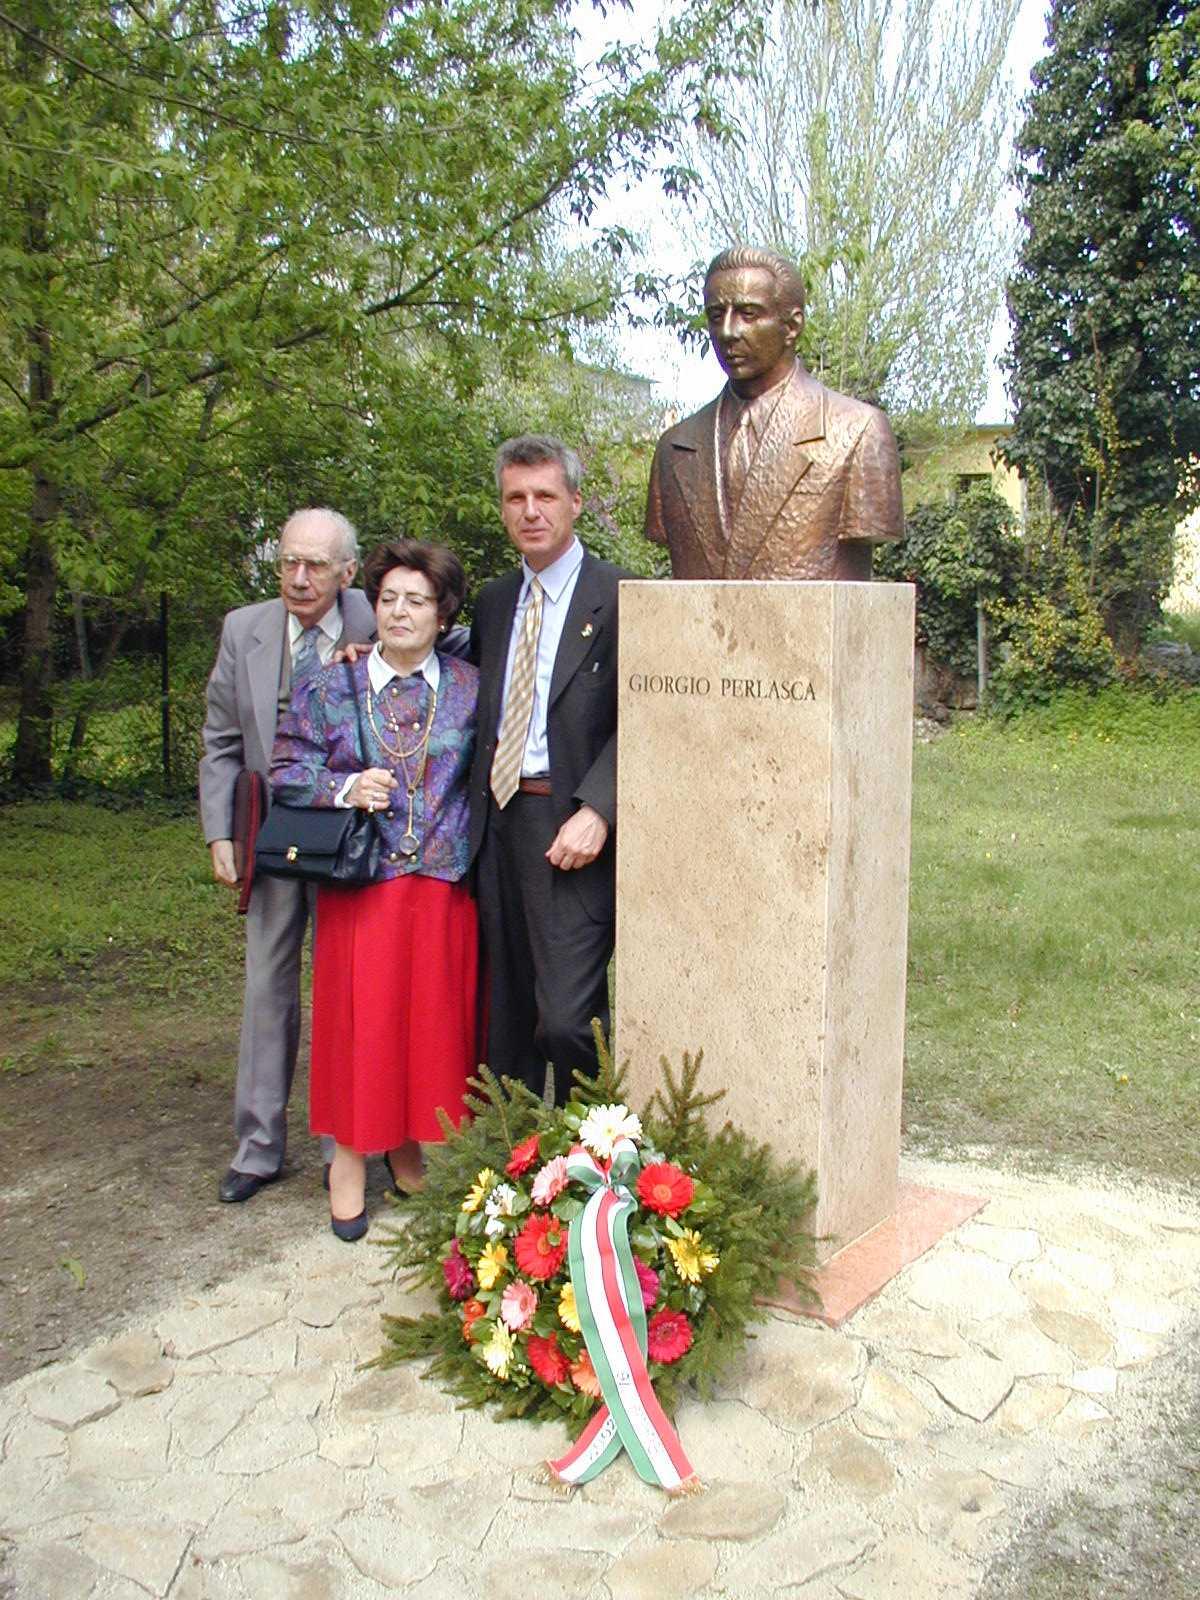 Eva e Pal Lang, due dei salvati, con Franco Perlasca